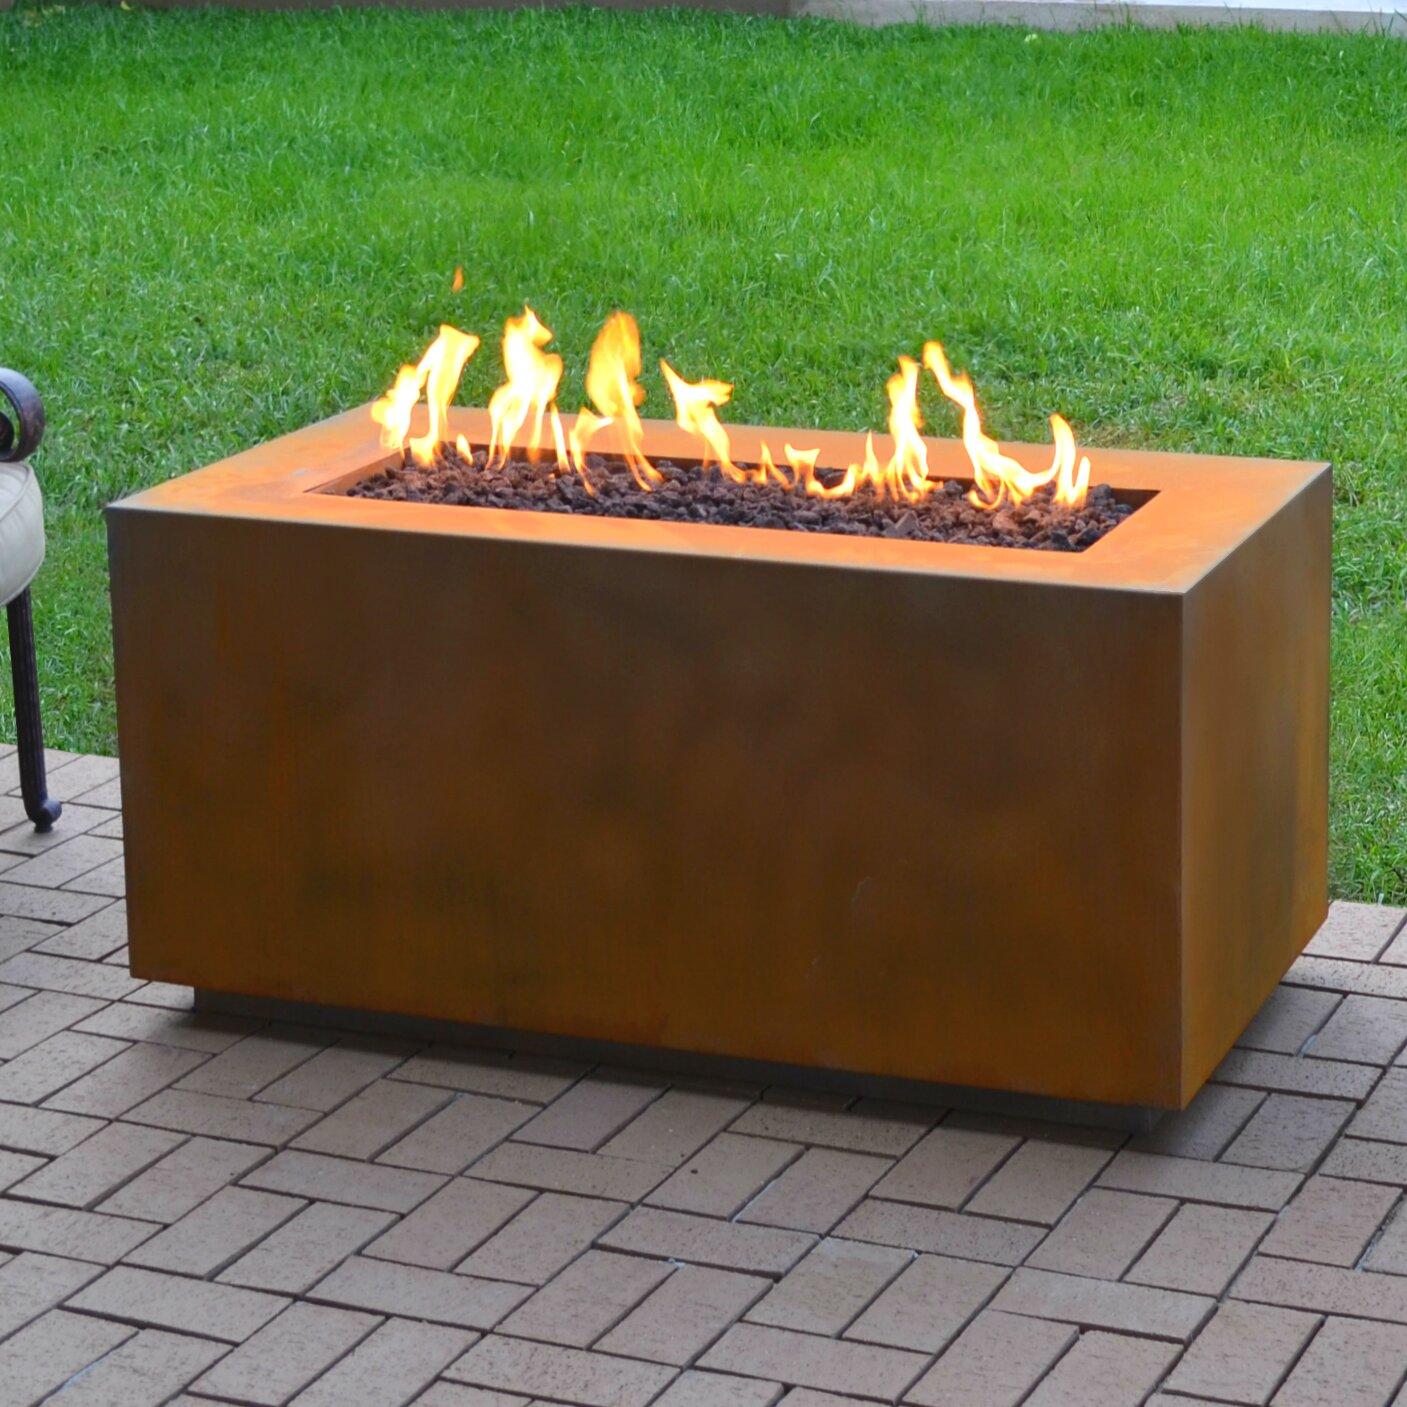 The Outdoor Plus Corten Steel Propane Fire Pit Table  : The Outdoor Plus Corten Steel Propane Fire Pit Table from www.wayfair.com size 1407 x 1407 jpeg 450kB